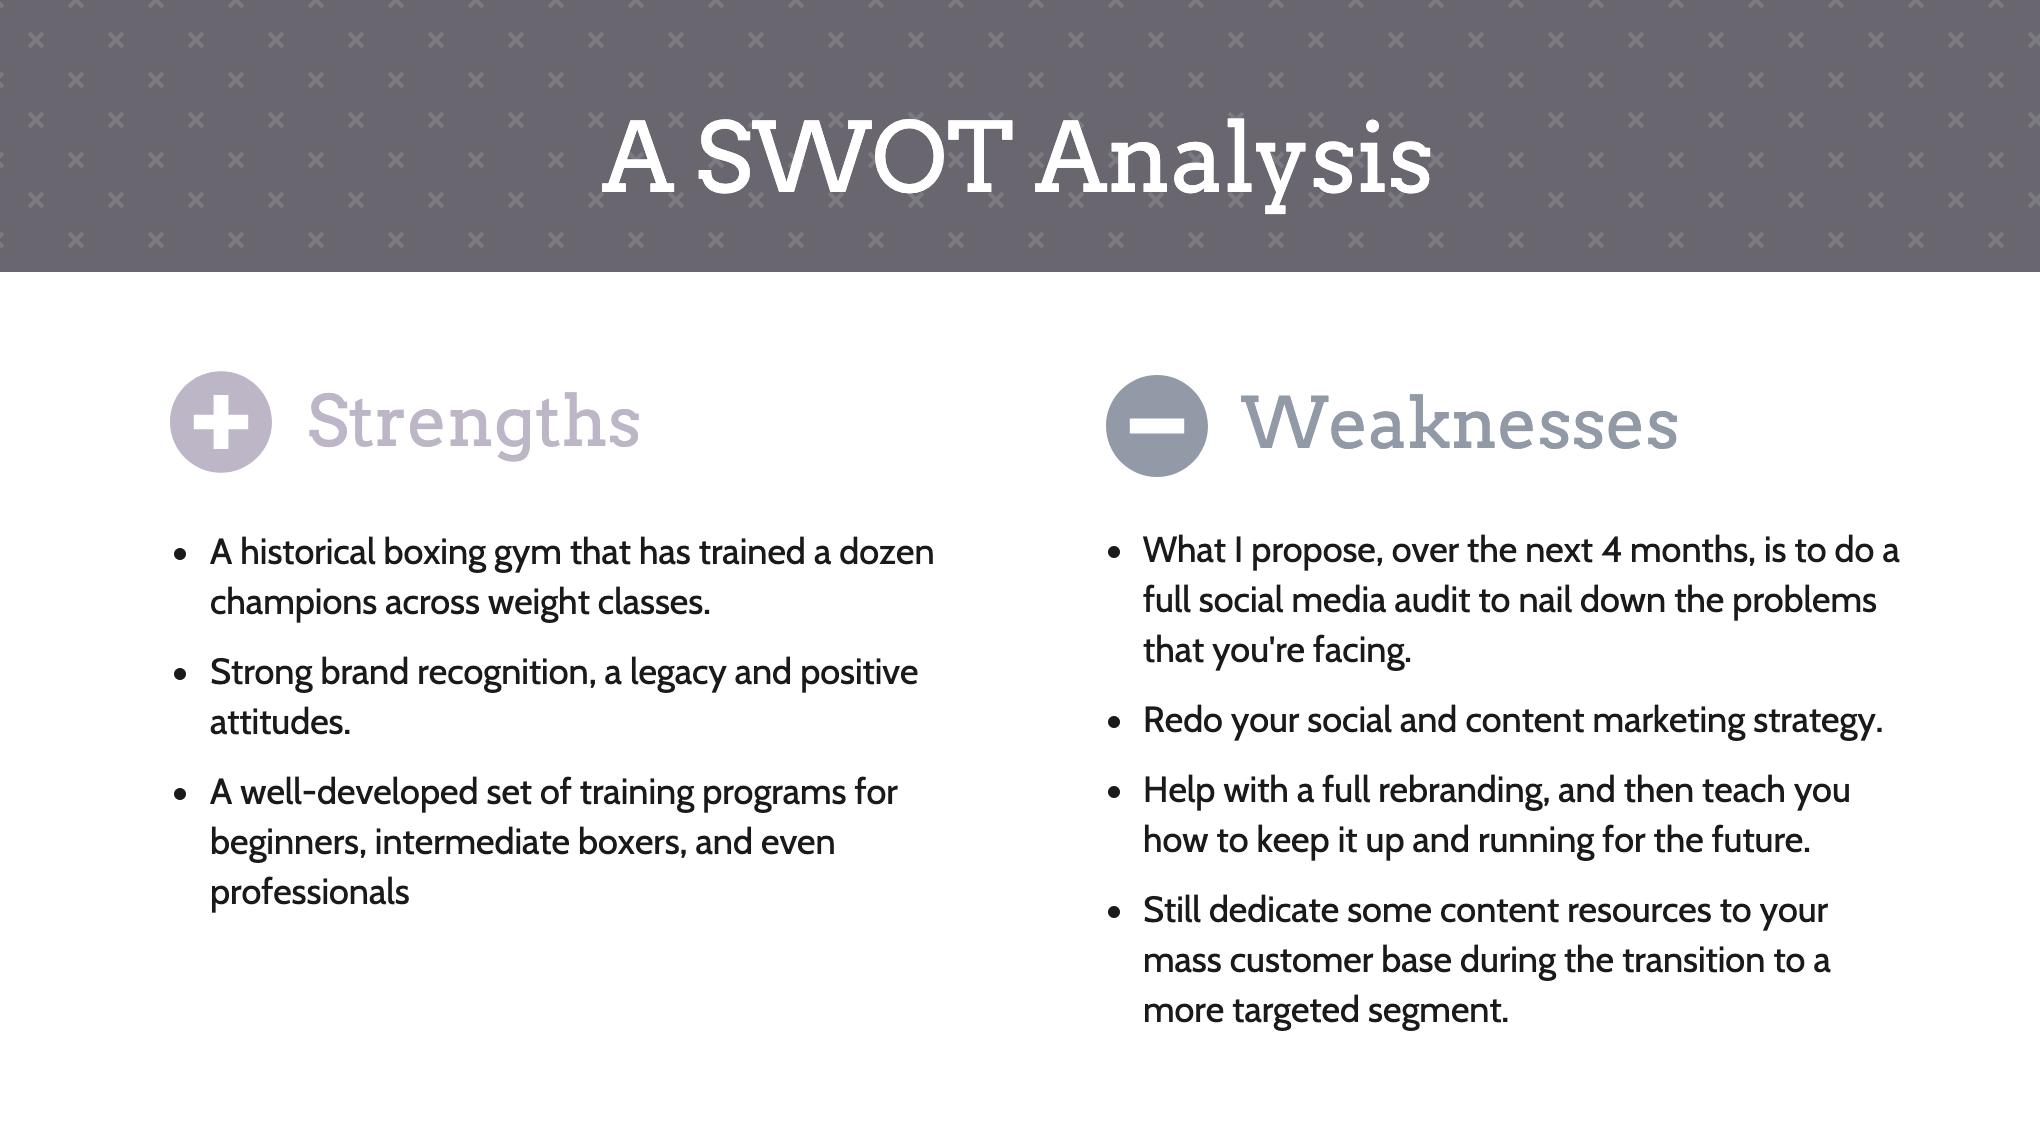 Swot analysis sxw template